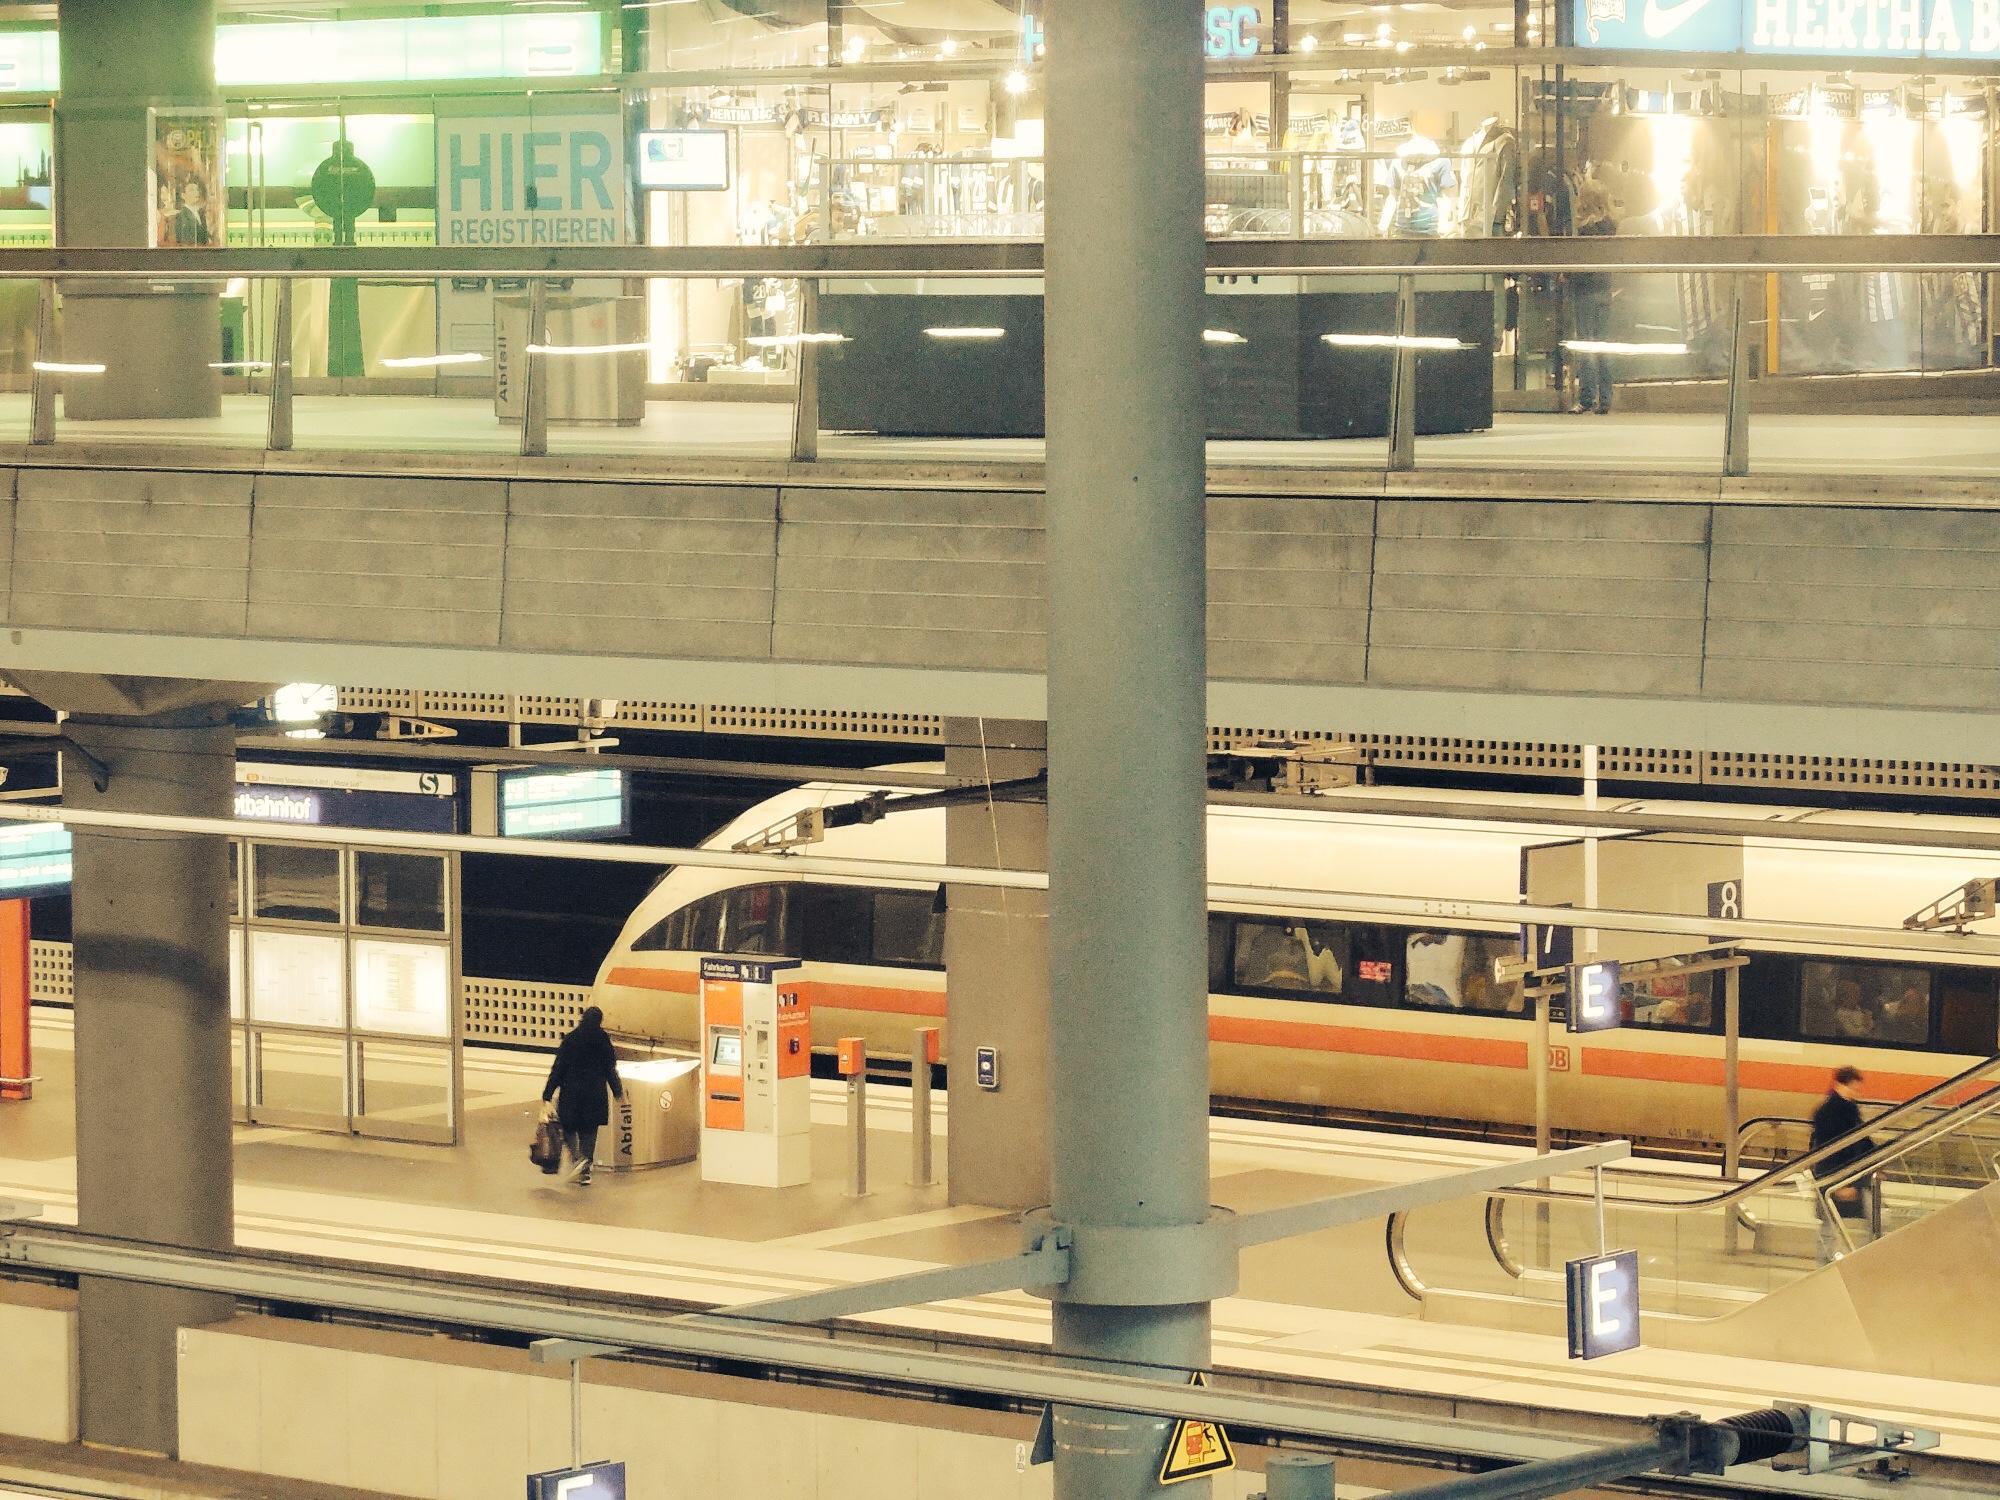 Trains at Berlin Hauptbahnhof